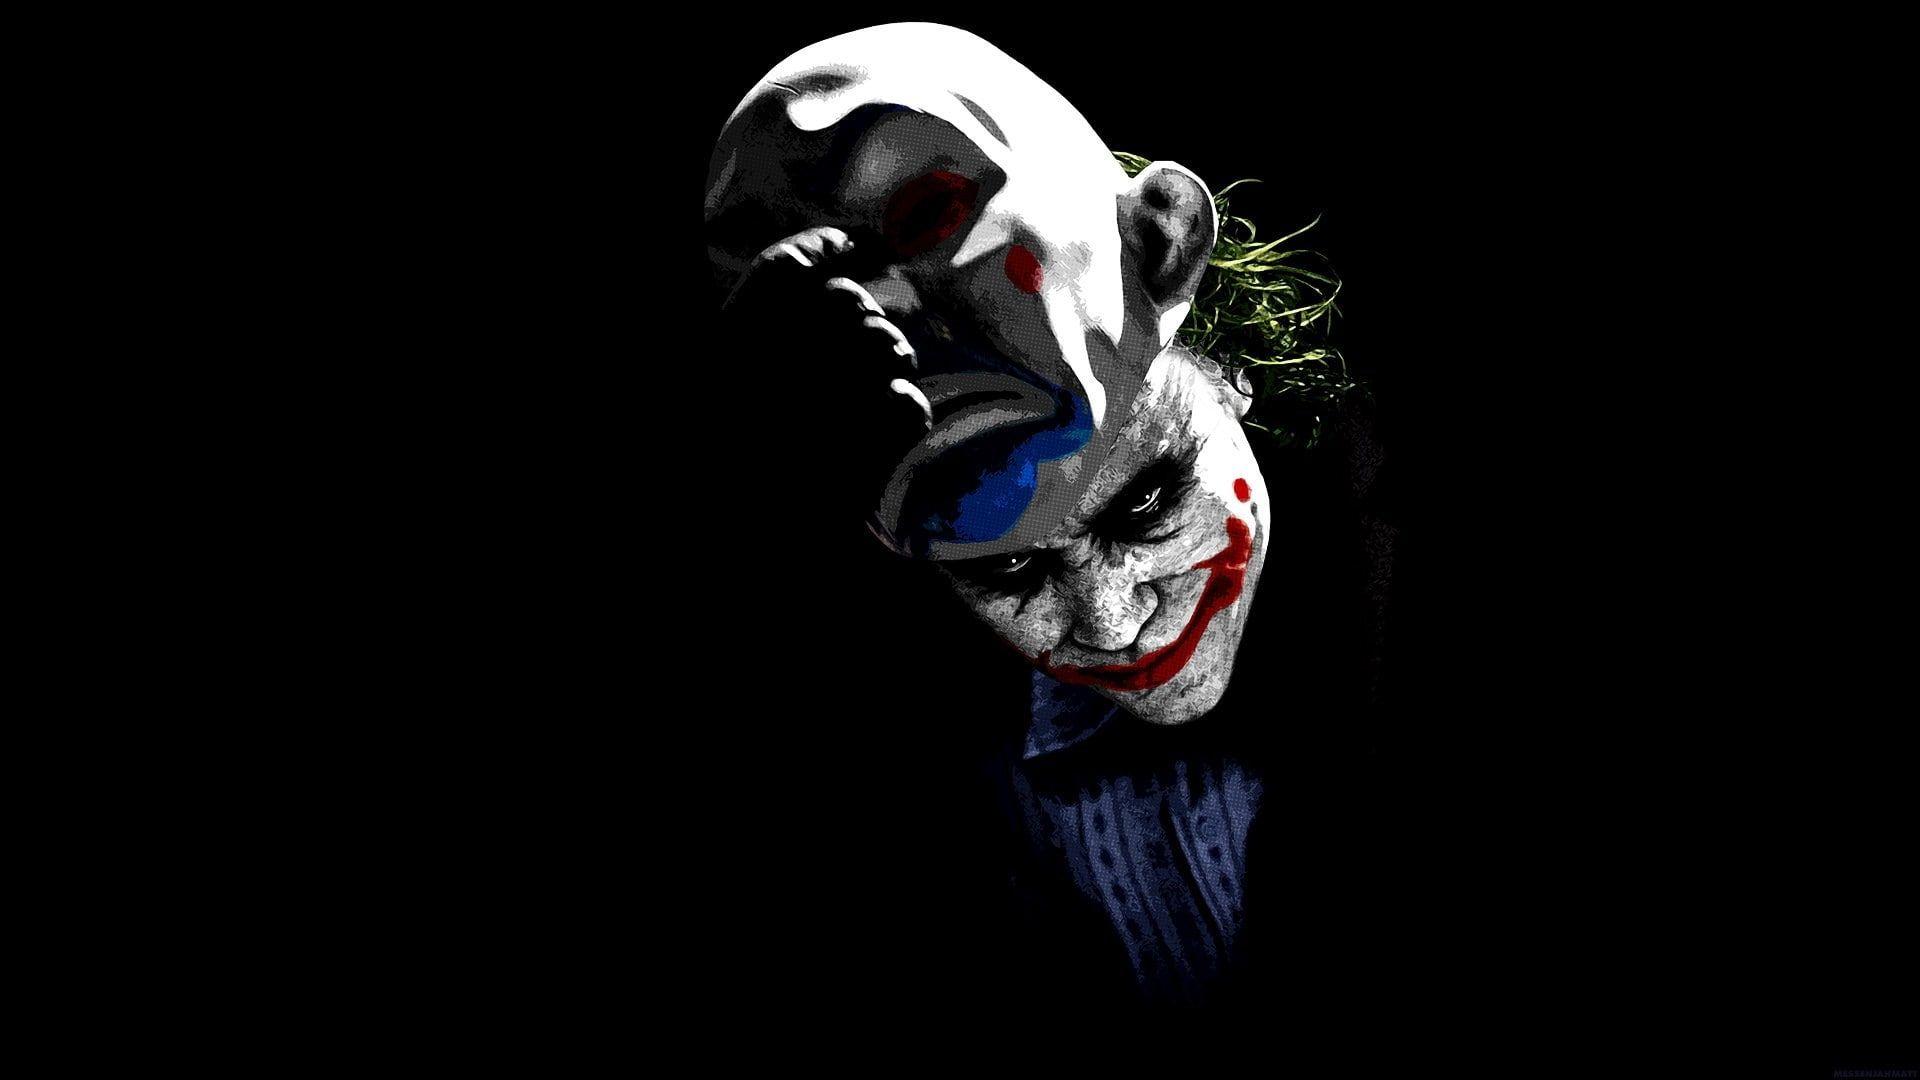 Joker Best 1080p Wallpaper Hdwallpaper Desktop In 2020 Pc Desktop Wallpaper Joker Iphone Wallpaper Joker Wallpapers